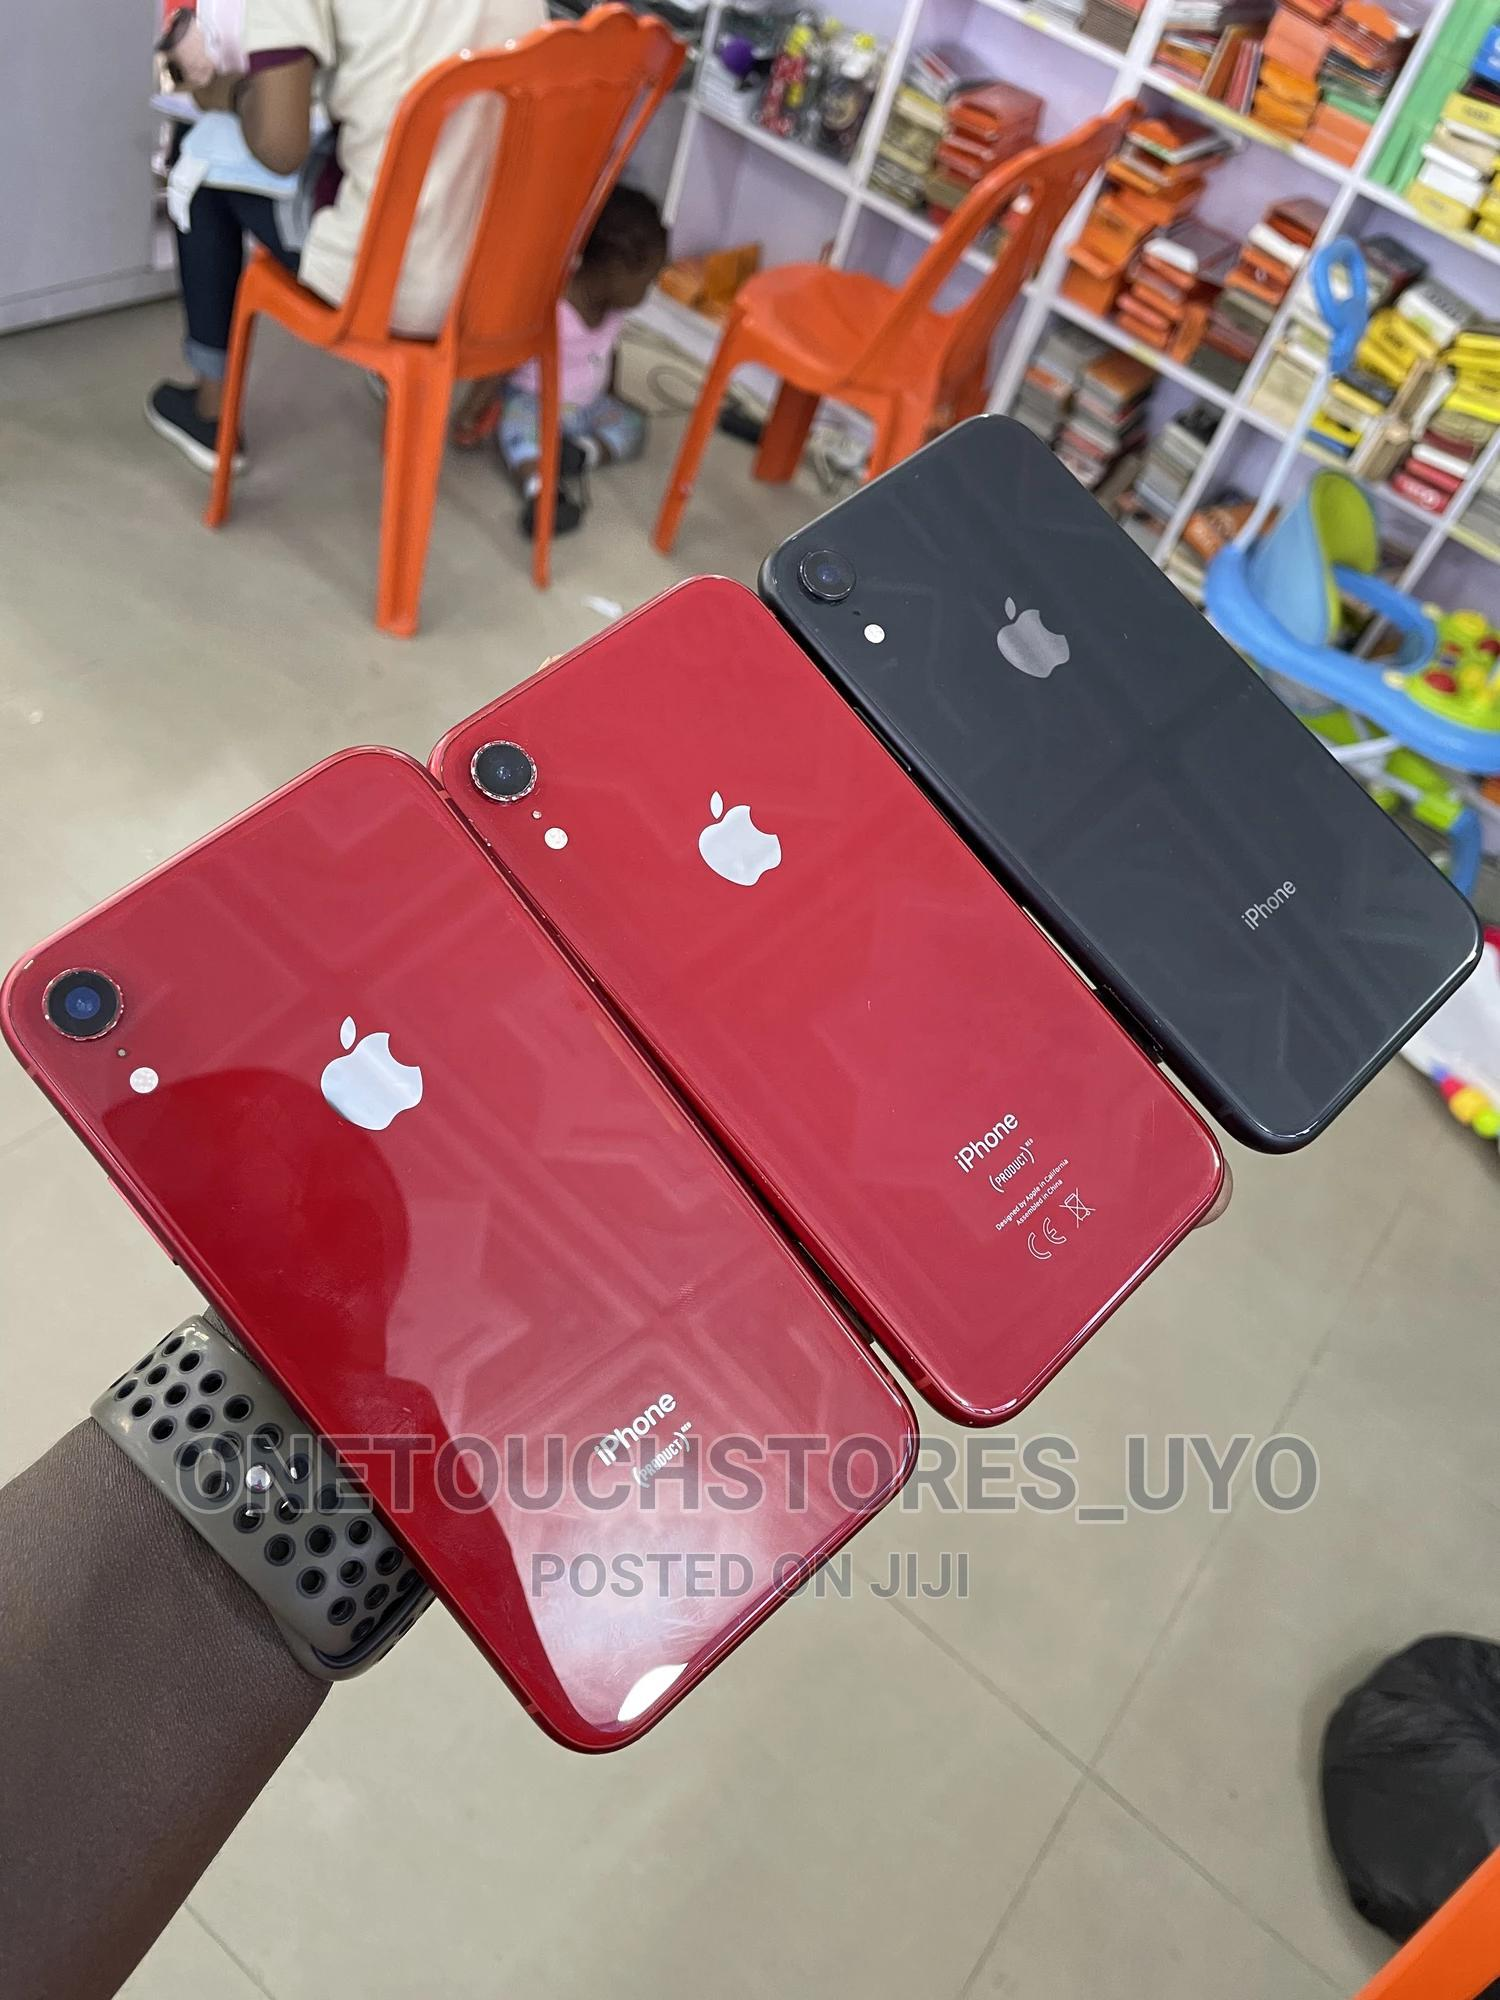 Apple iPhone XR 128 GB Black   Mobile Phones for sale in Uyo, Akwa Ibom State, Nigeria